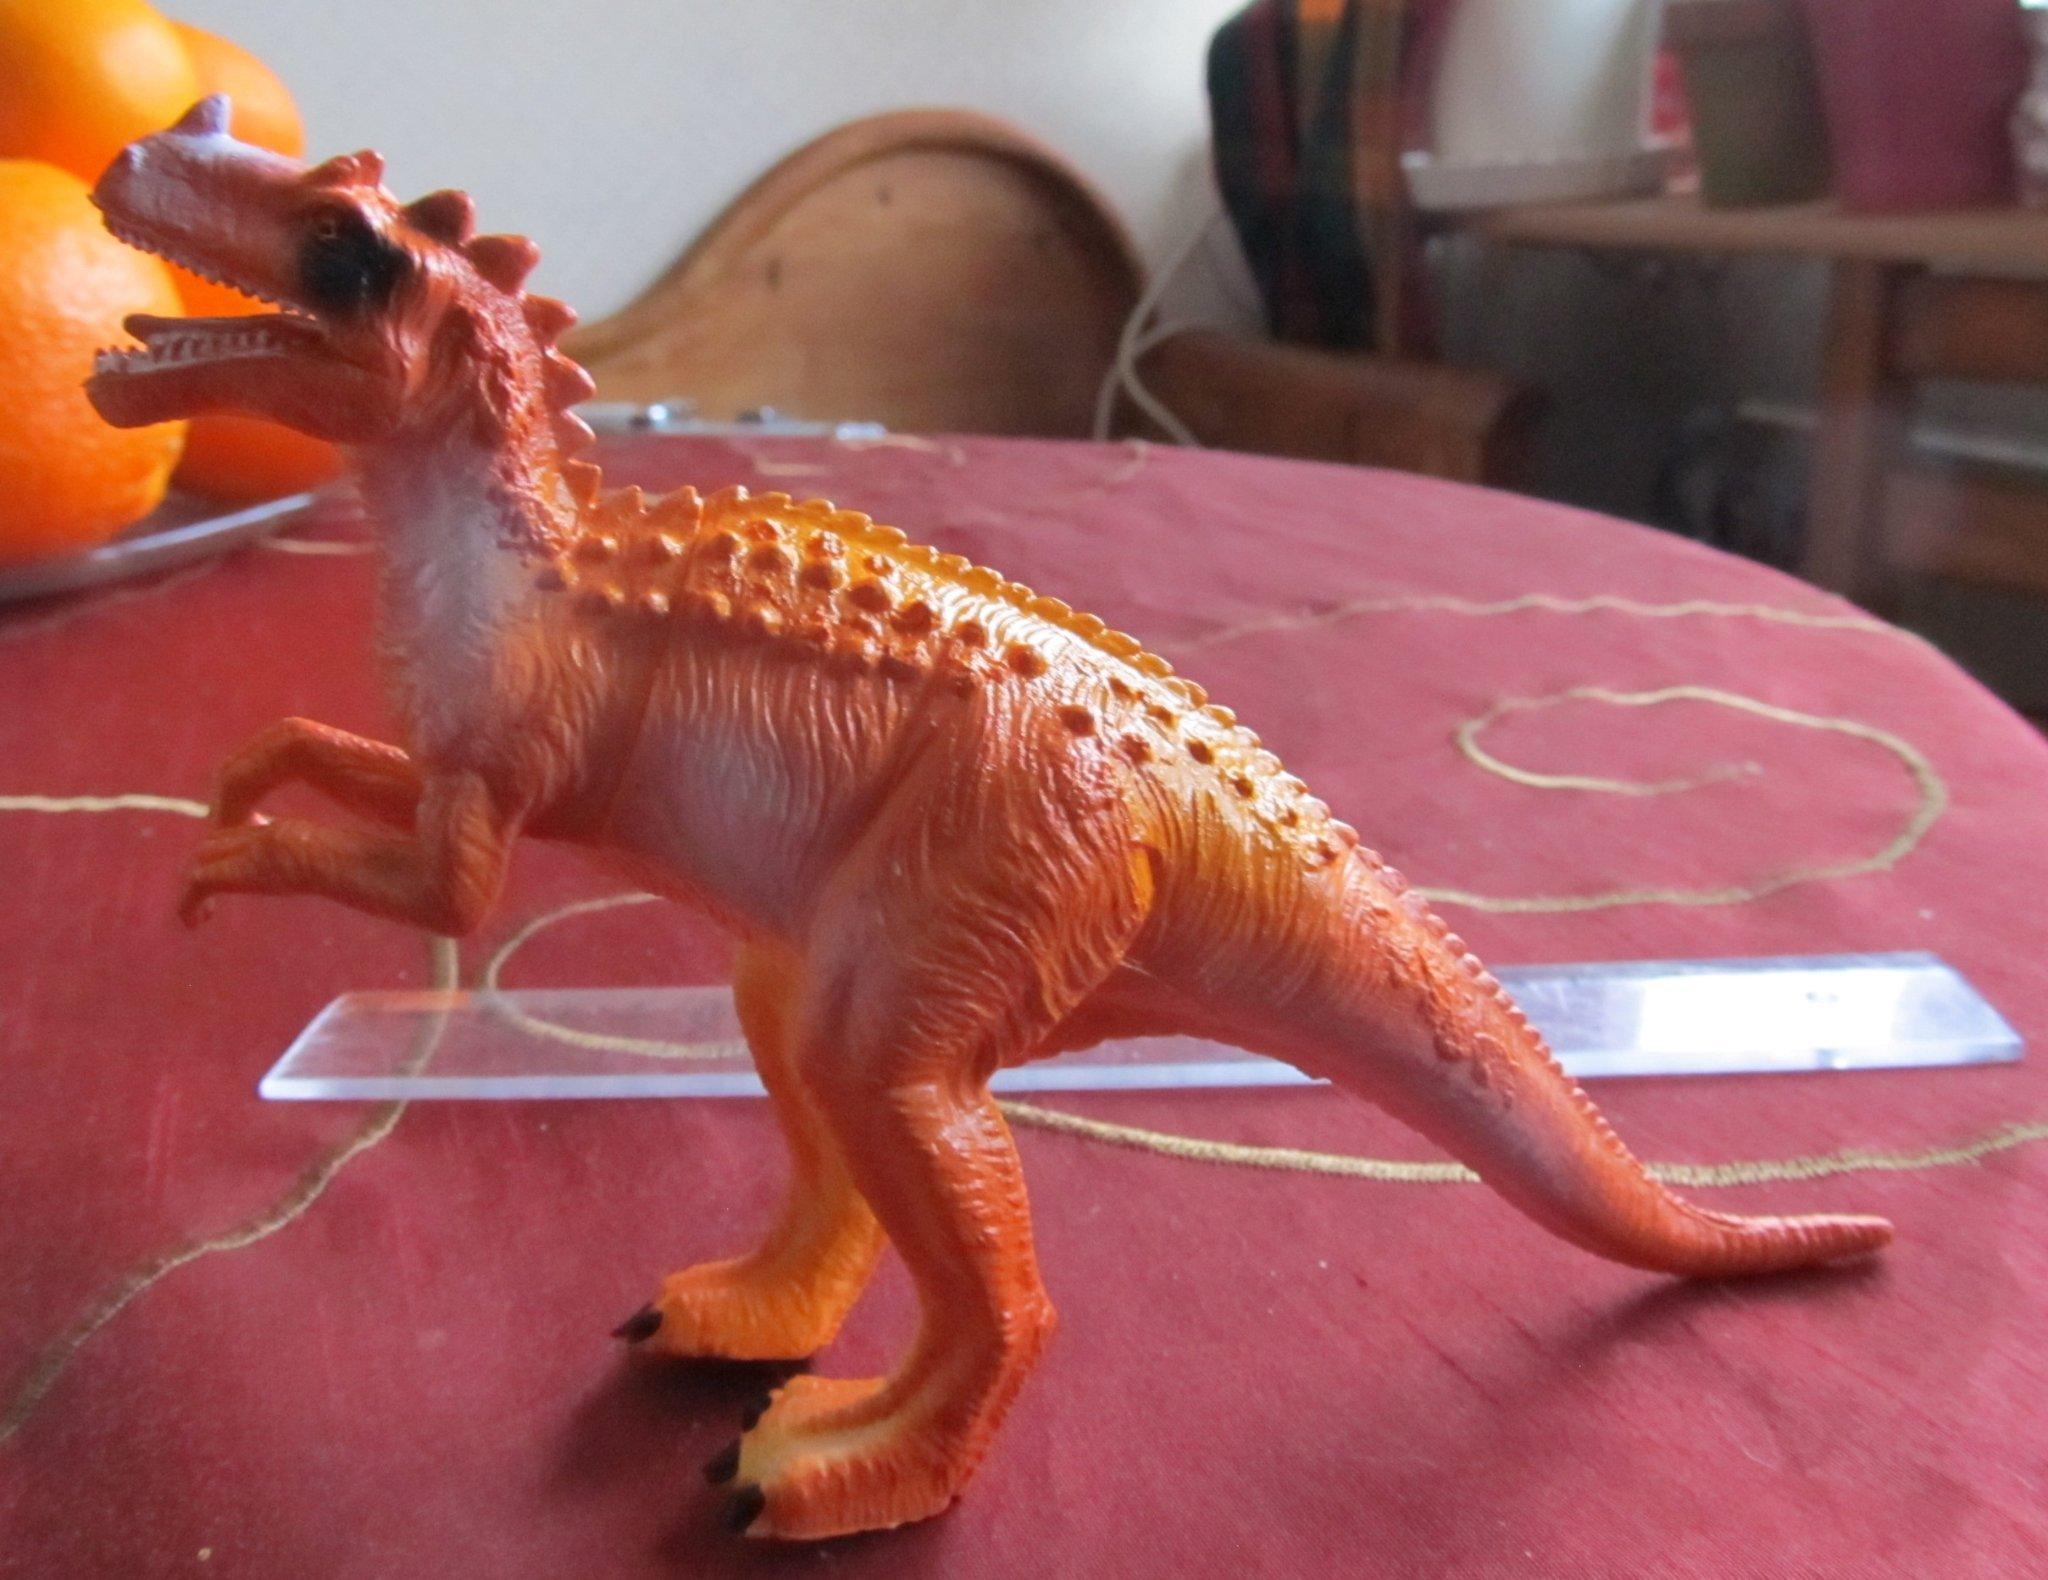 Dinosaur Av Mjuk Plast 10 X 18 Cm Omedelbart 349319732 ᐈ Köp